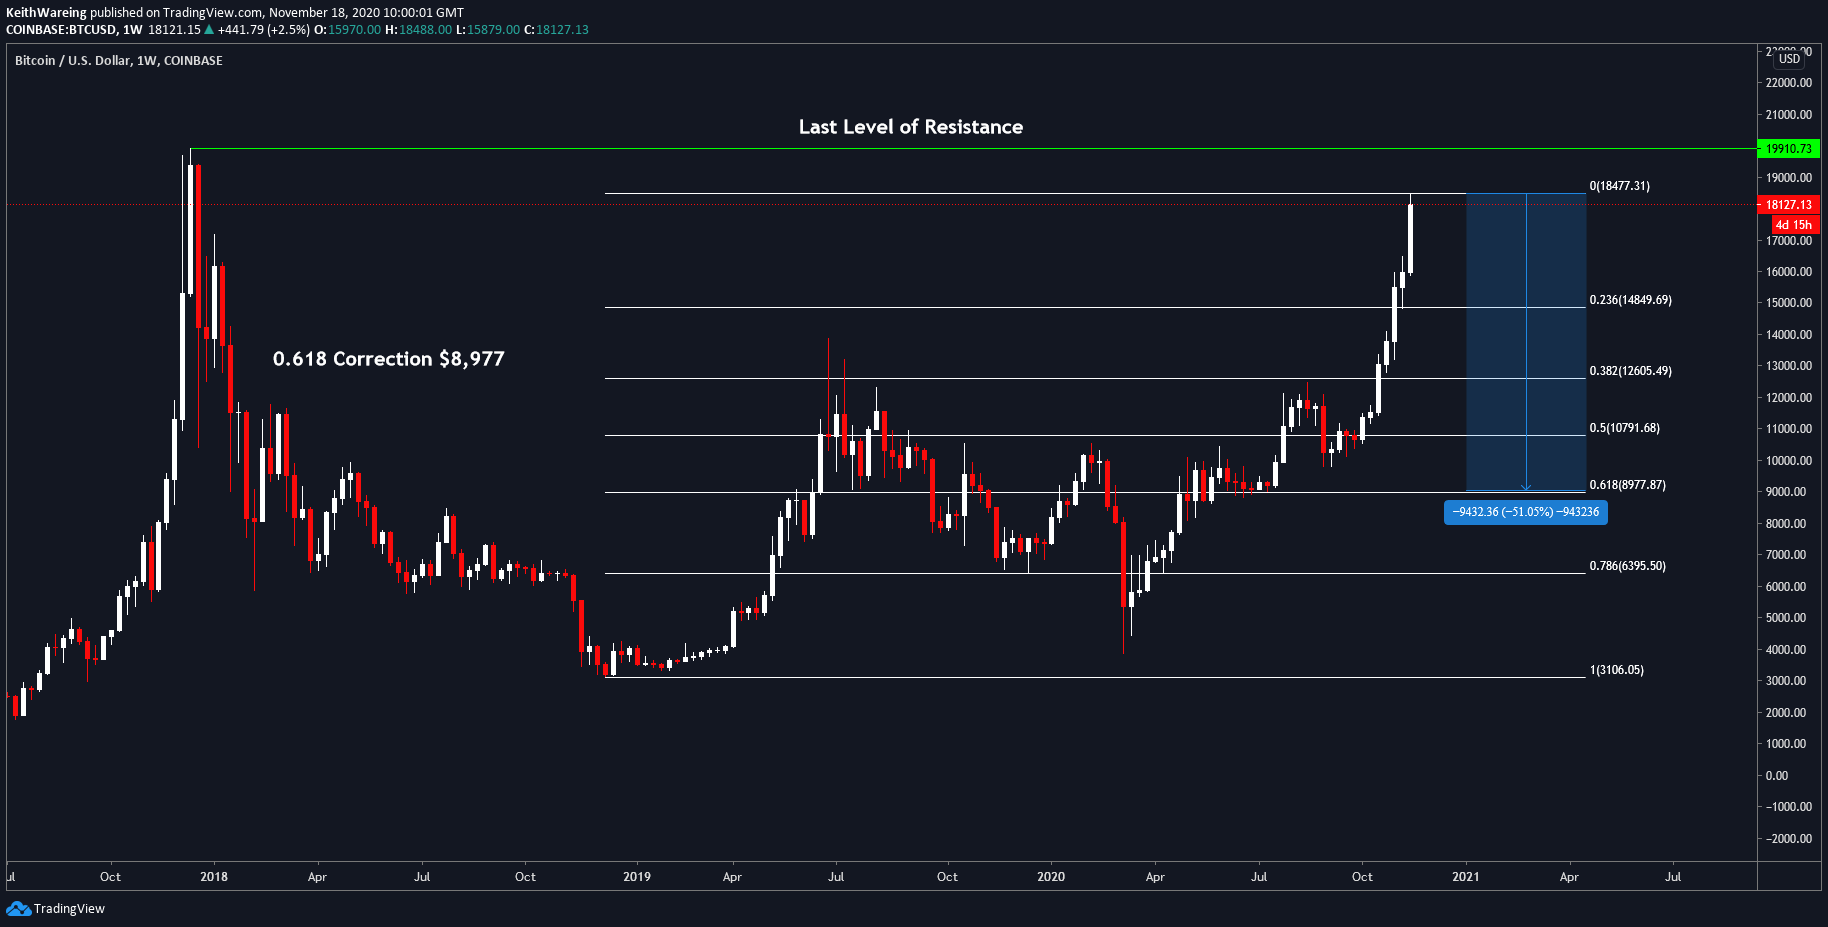 Grafico BTC/USD a 1 settimana